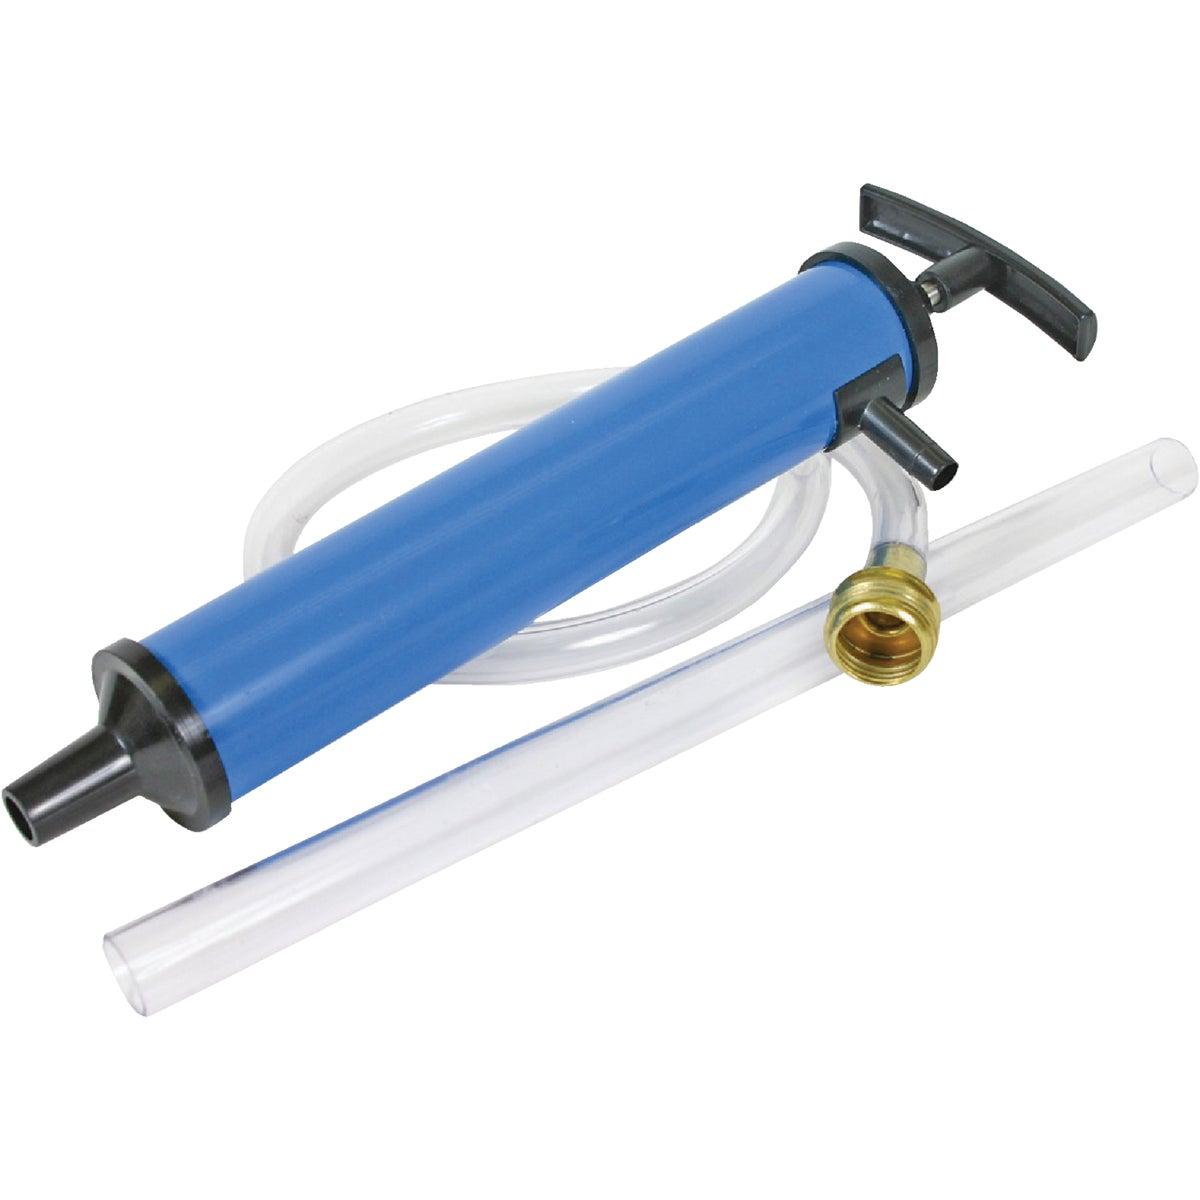 Rv Hand Pump Kit